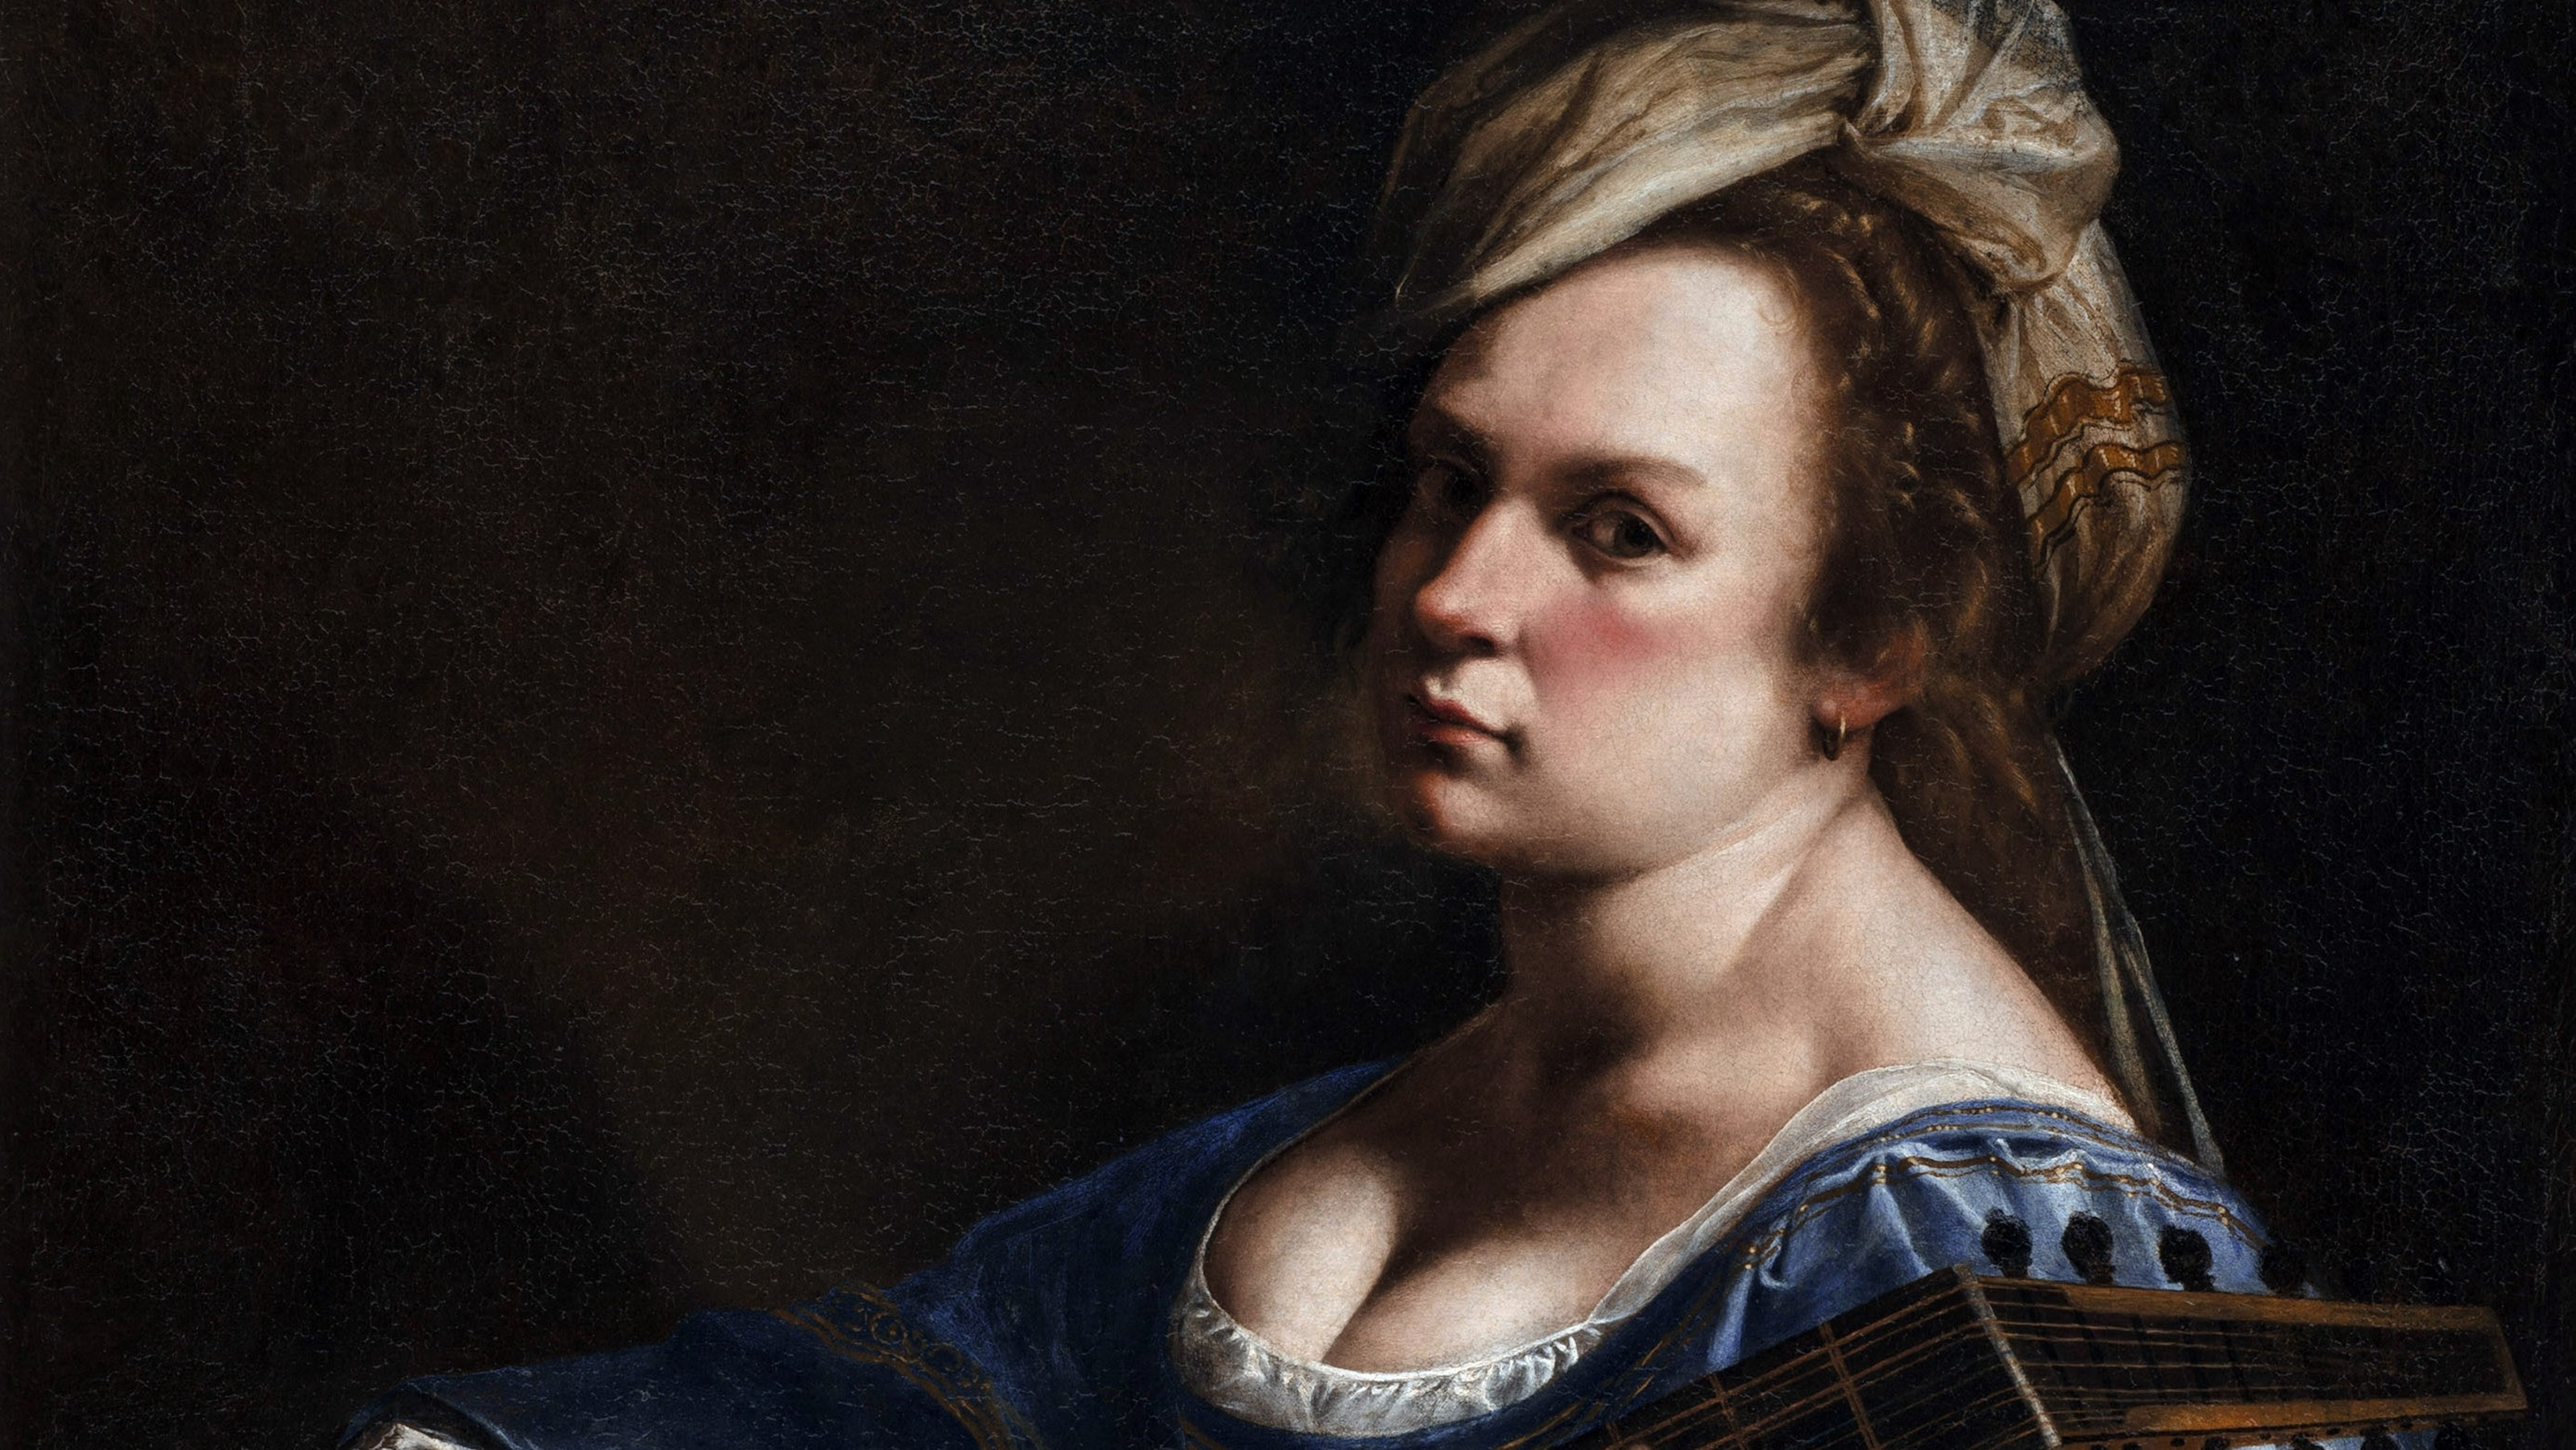 Italian artist Artemisia Gentileschi risked everything to